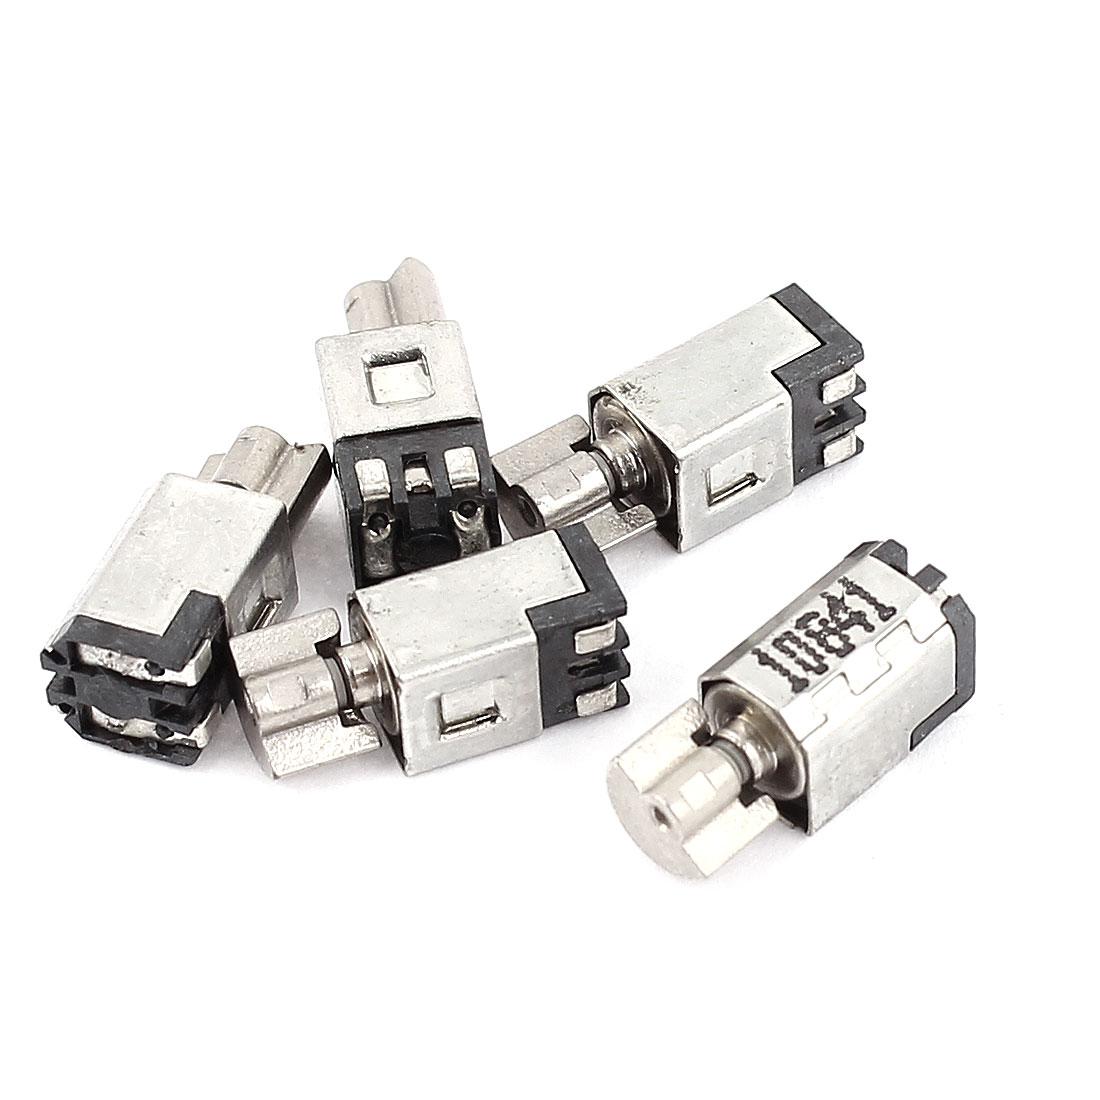 5pcs DC 1.5-3V 1500RPM  Micro Toy Vibration Motor 4.5x5x11mm